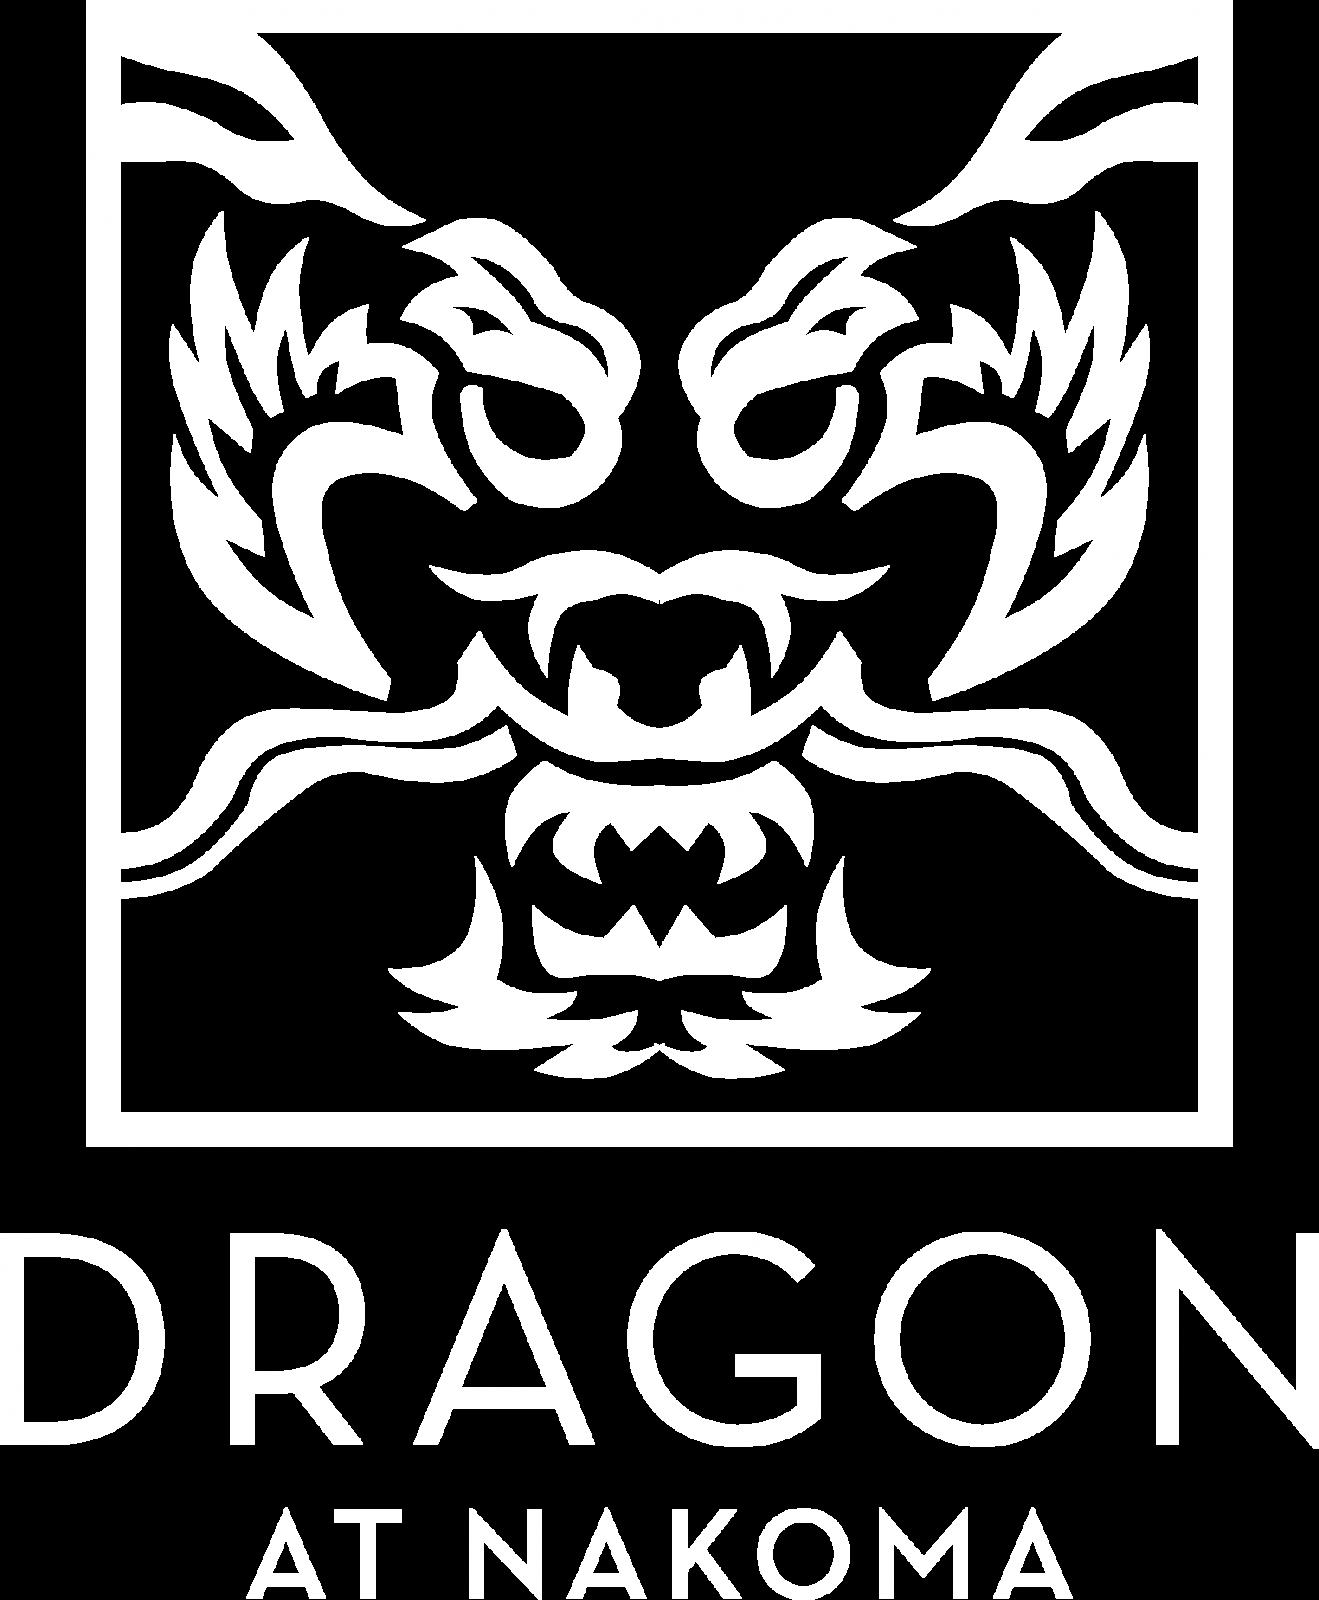 The Dragon Golf Logo